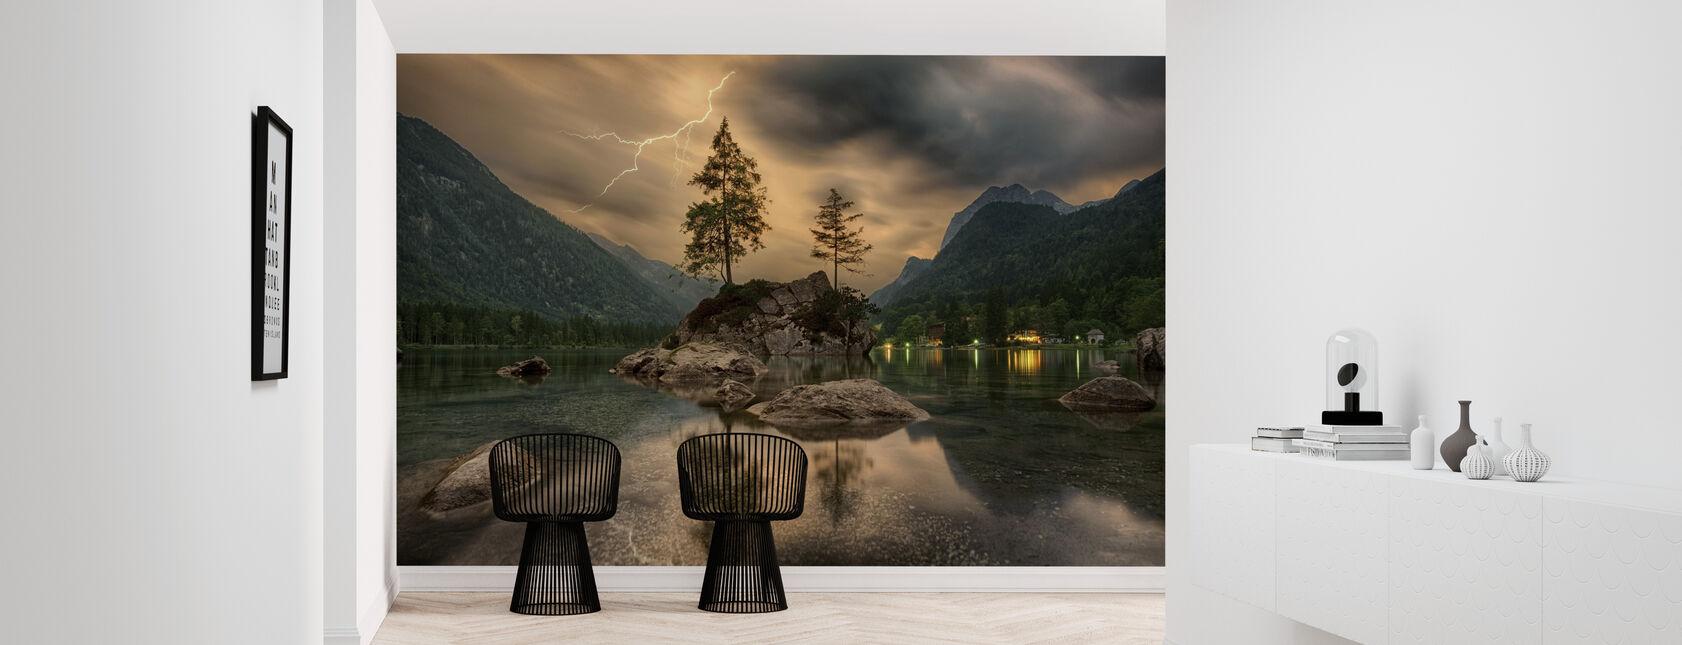 Lake Tree - Wallpaper - Hallway